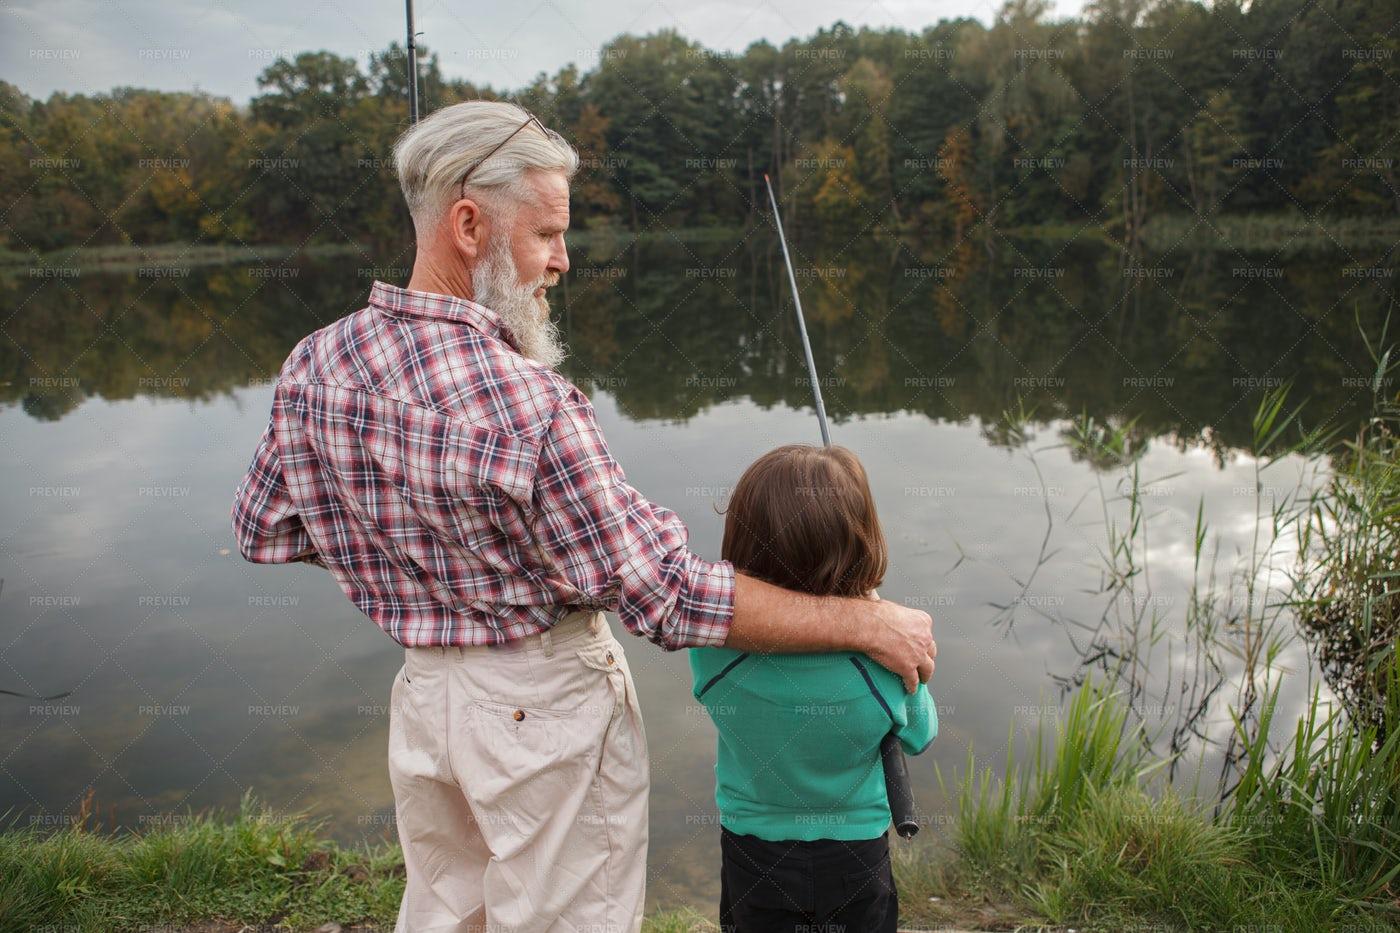 Grandpa Hugging Grandson While Fishing: Stock Photos